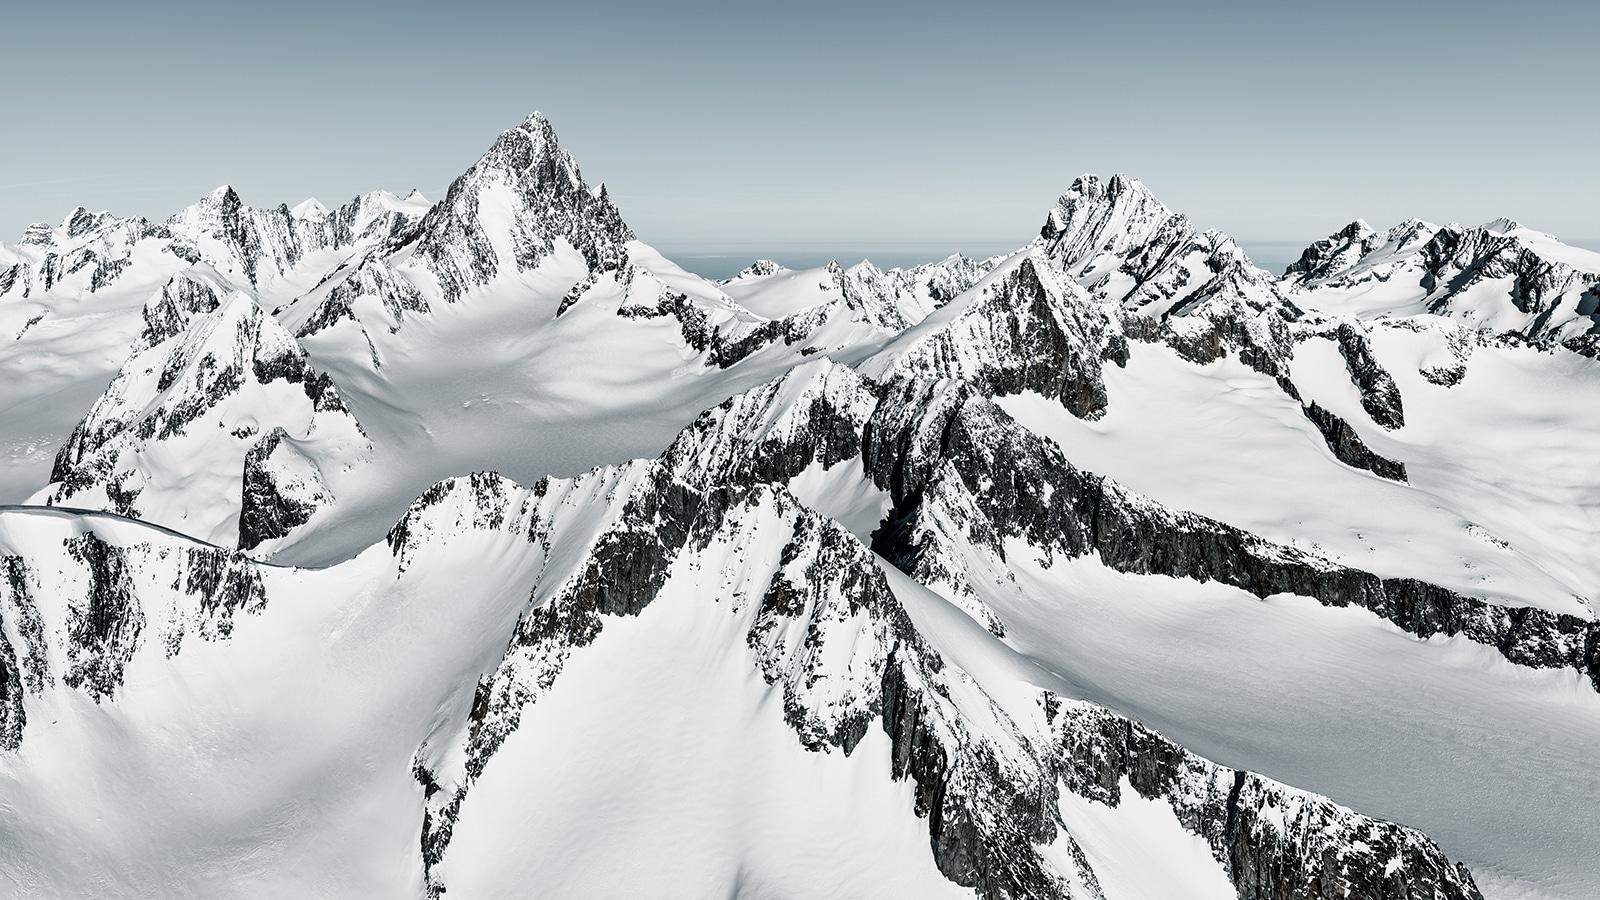 Finsteraarhorn im Winter mit Blick auf Oberaarrothorn, Agassiszhorn, Oberaarhorn, Finsteraargletscher, Fieschergletscher, Lauteraarhorn, Schreckhorn, Lauteraargletscher